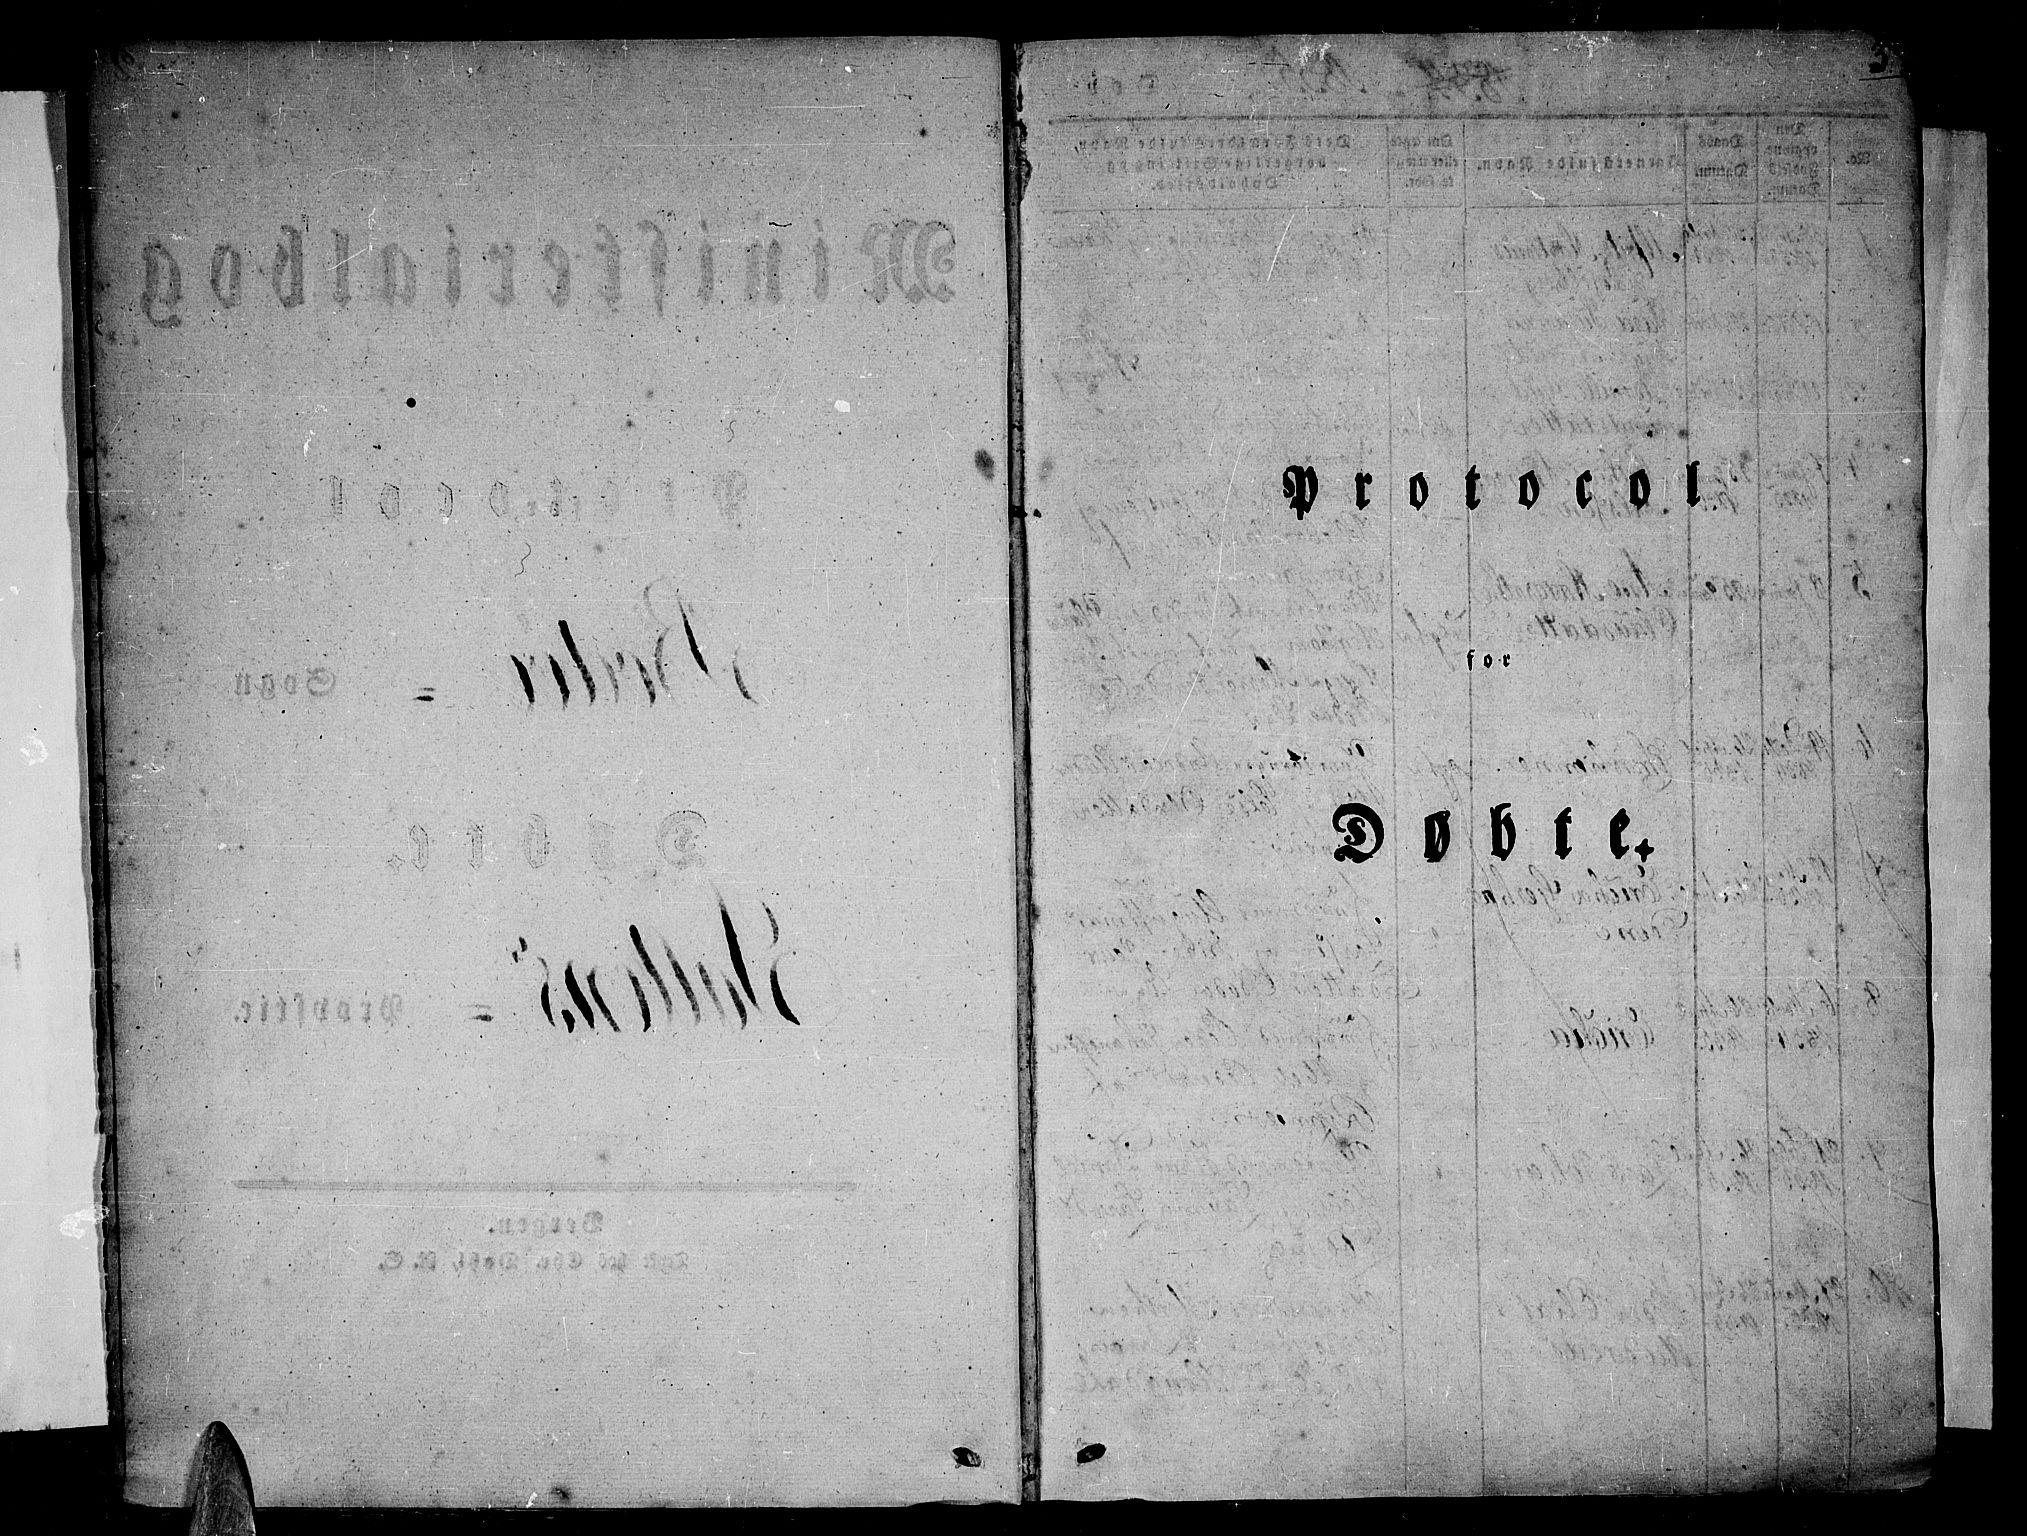 SAT, Ministerialprotokoller, klokkerbøker og fødselsregistre - Nordland, 801/L0006: Ministerialbok nr. 801A06, 1834-1845, s. 3